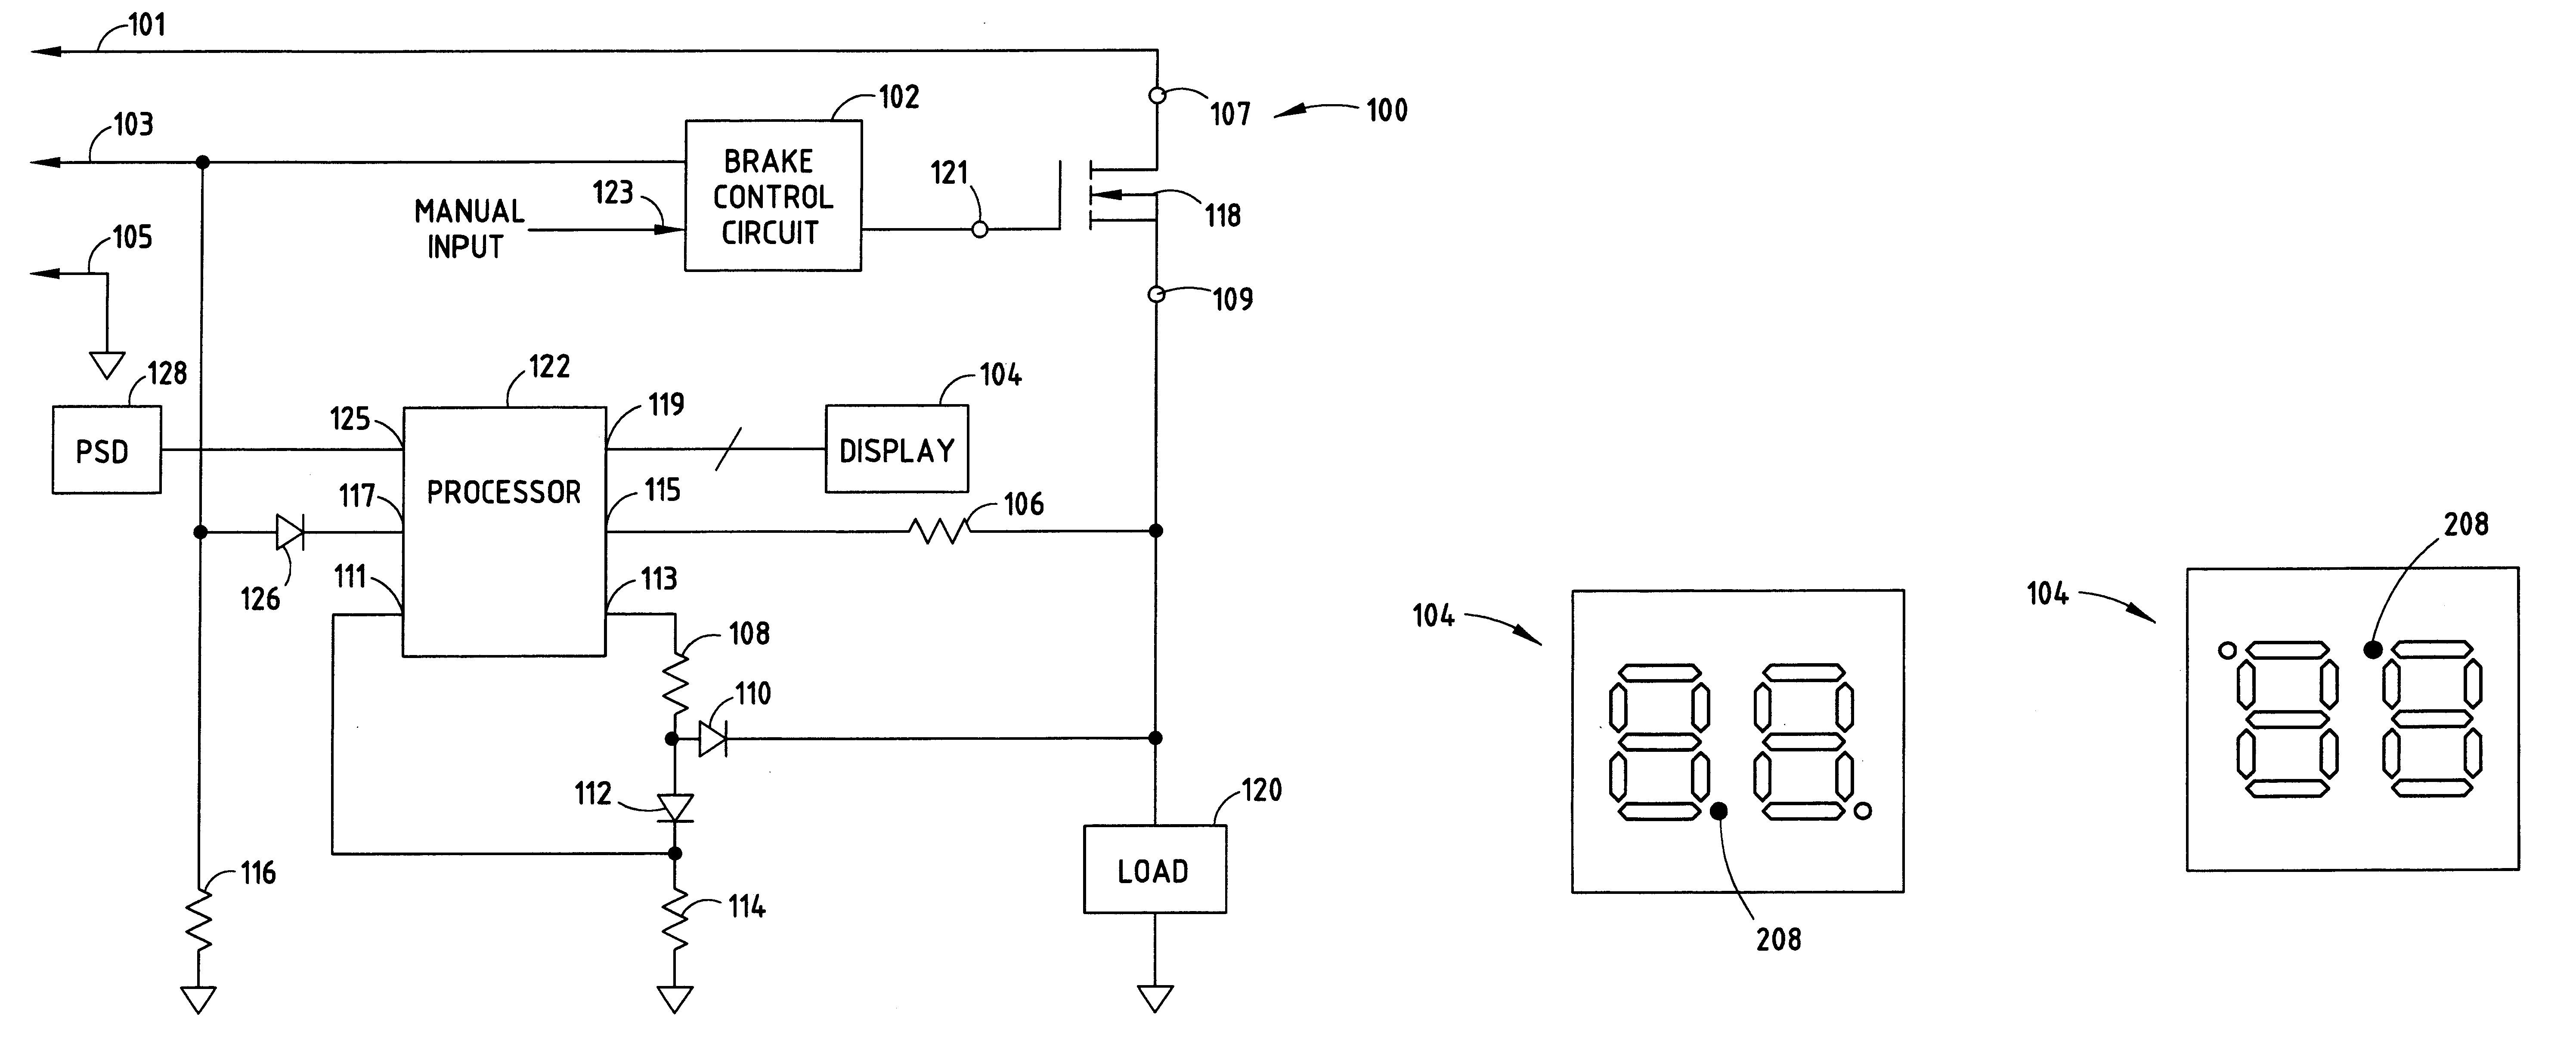 Ford f trailer brake controller wiring diagram